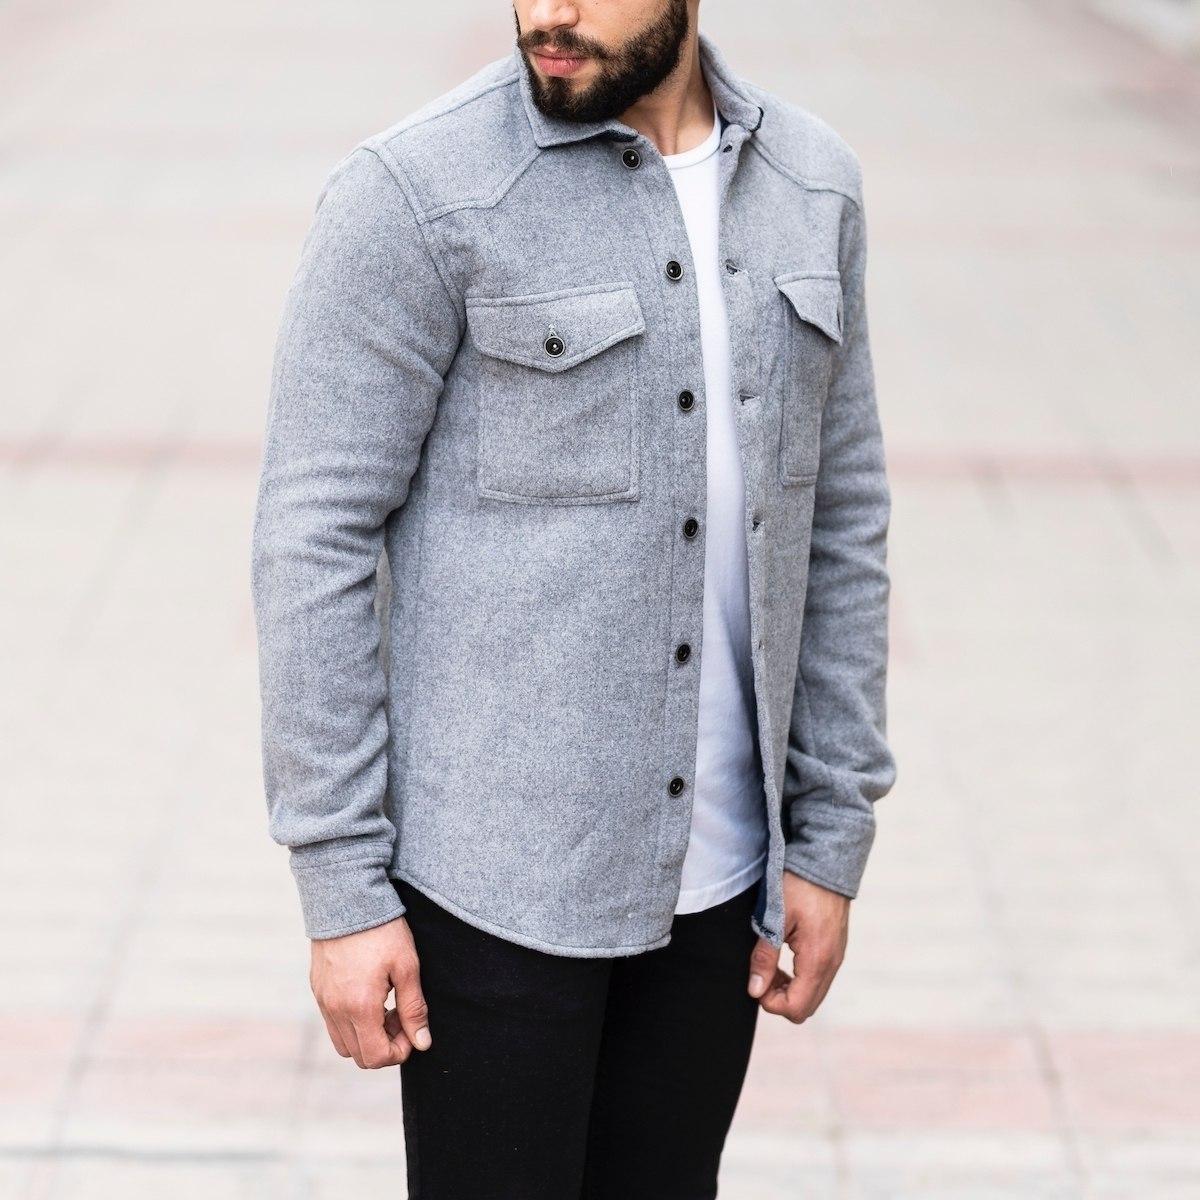 Men's Woolen Jacket-Shirt...